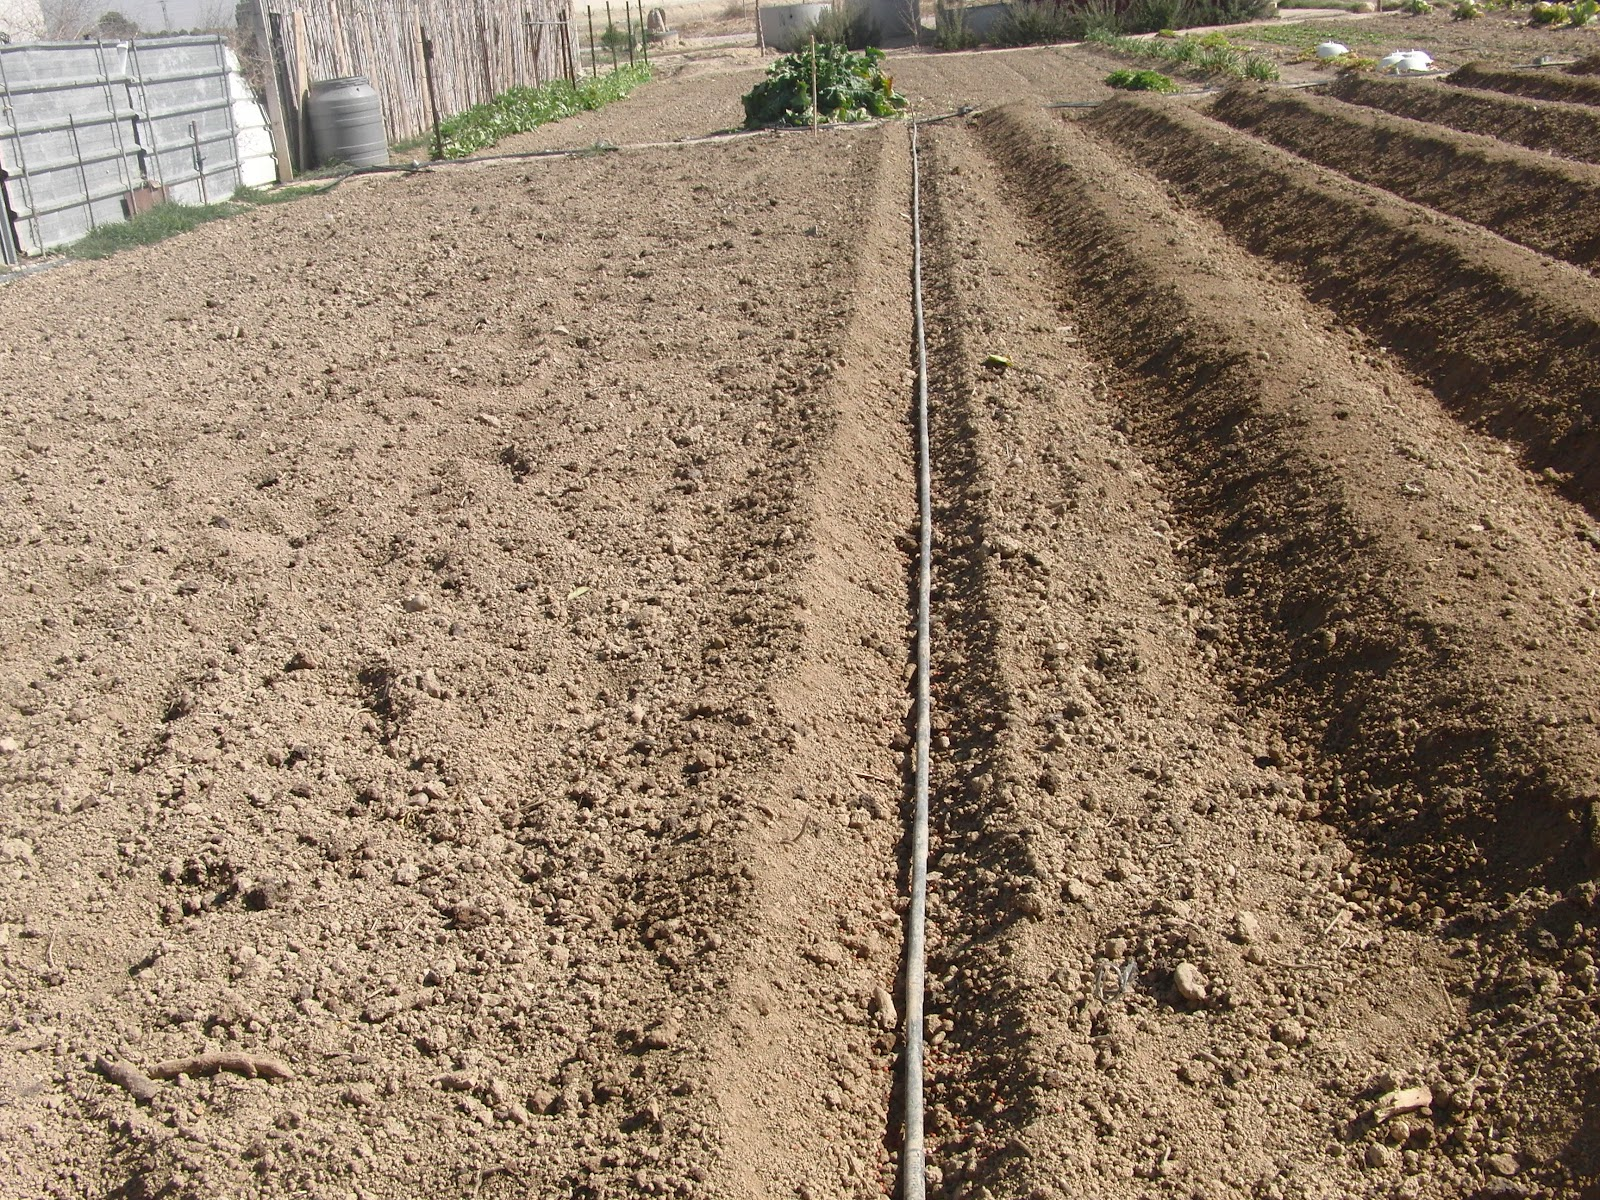 Un huerto familiar sembrar patatas 28 de febrero for Como cultivar patatas